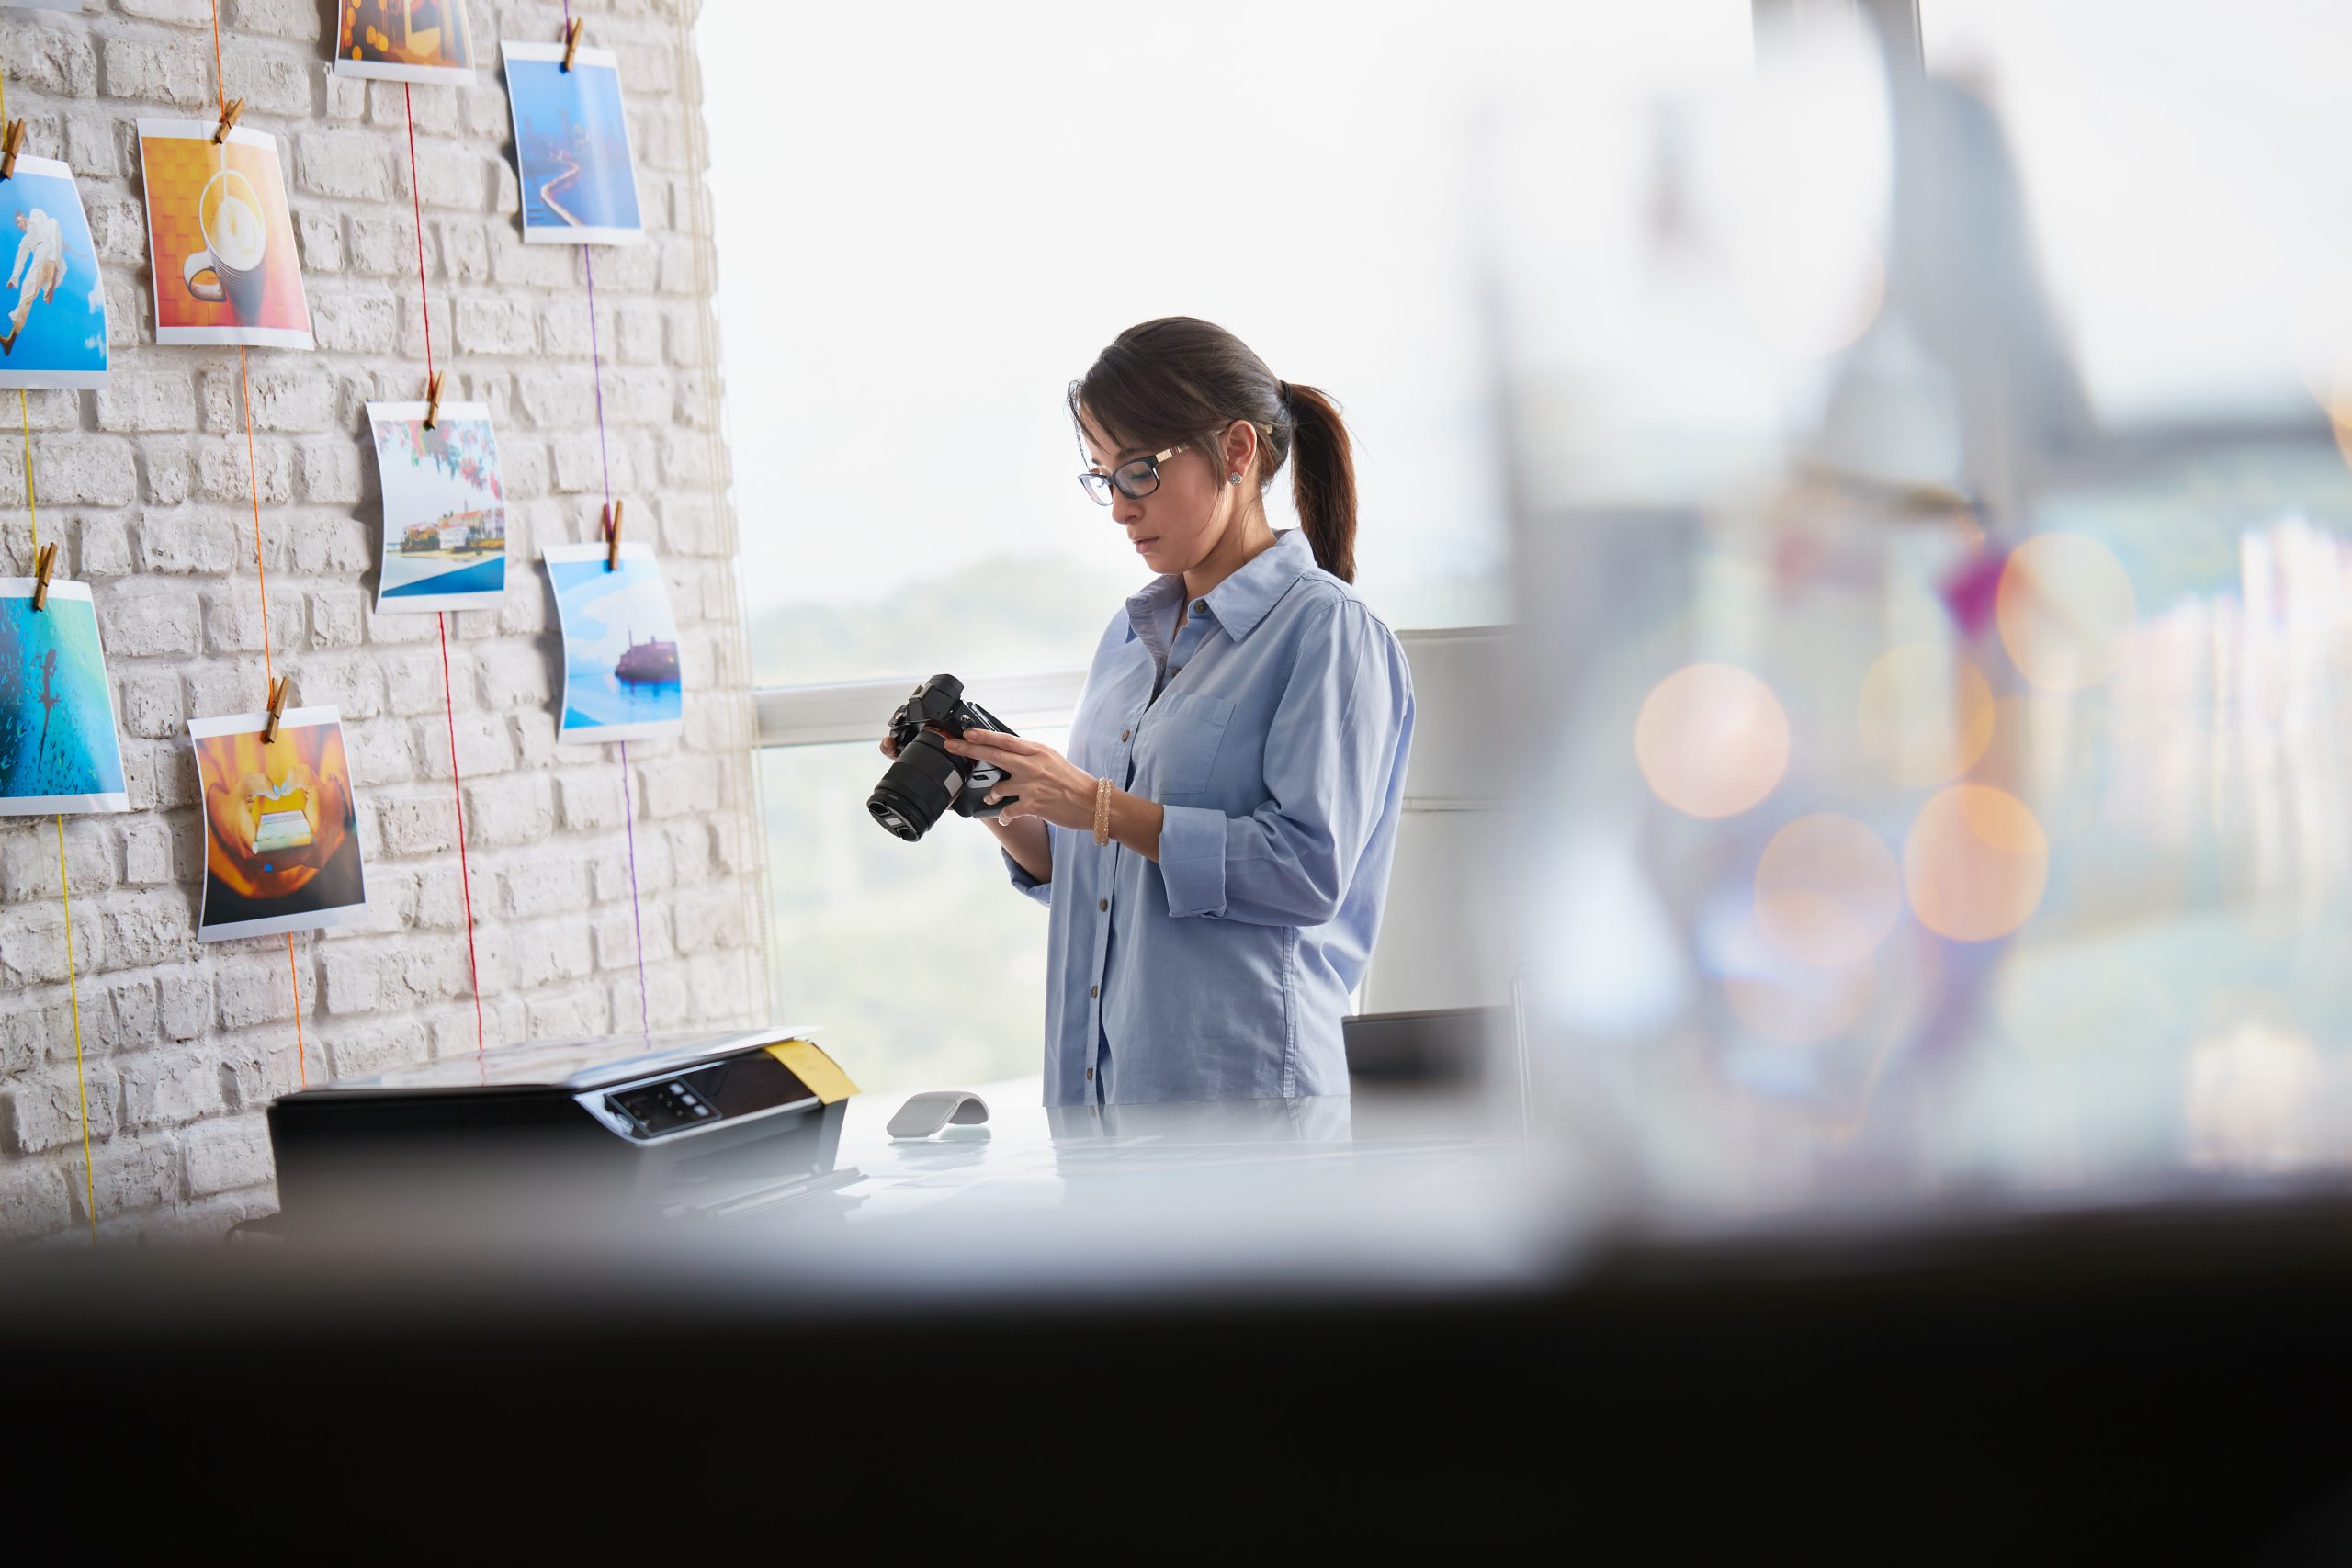 photographer women creative studio